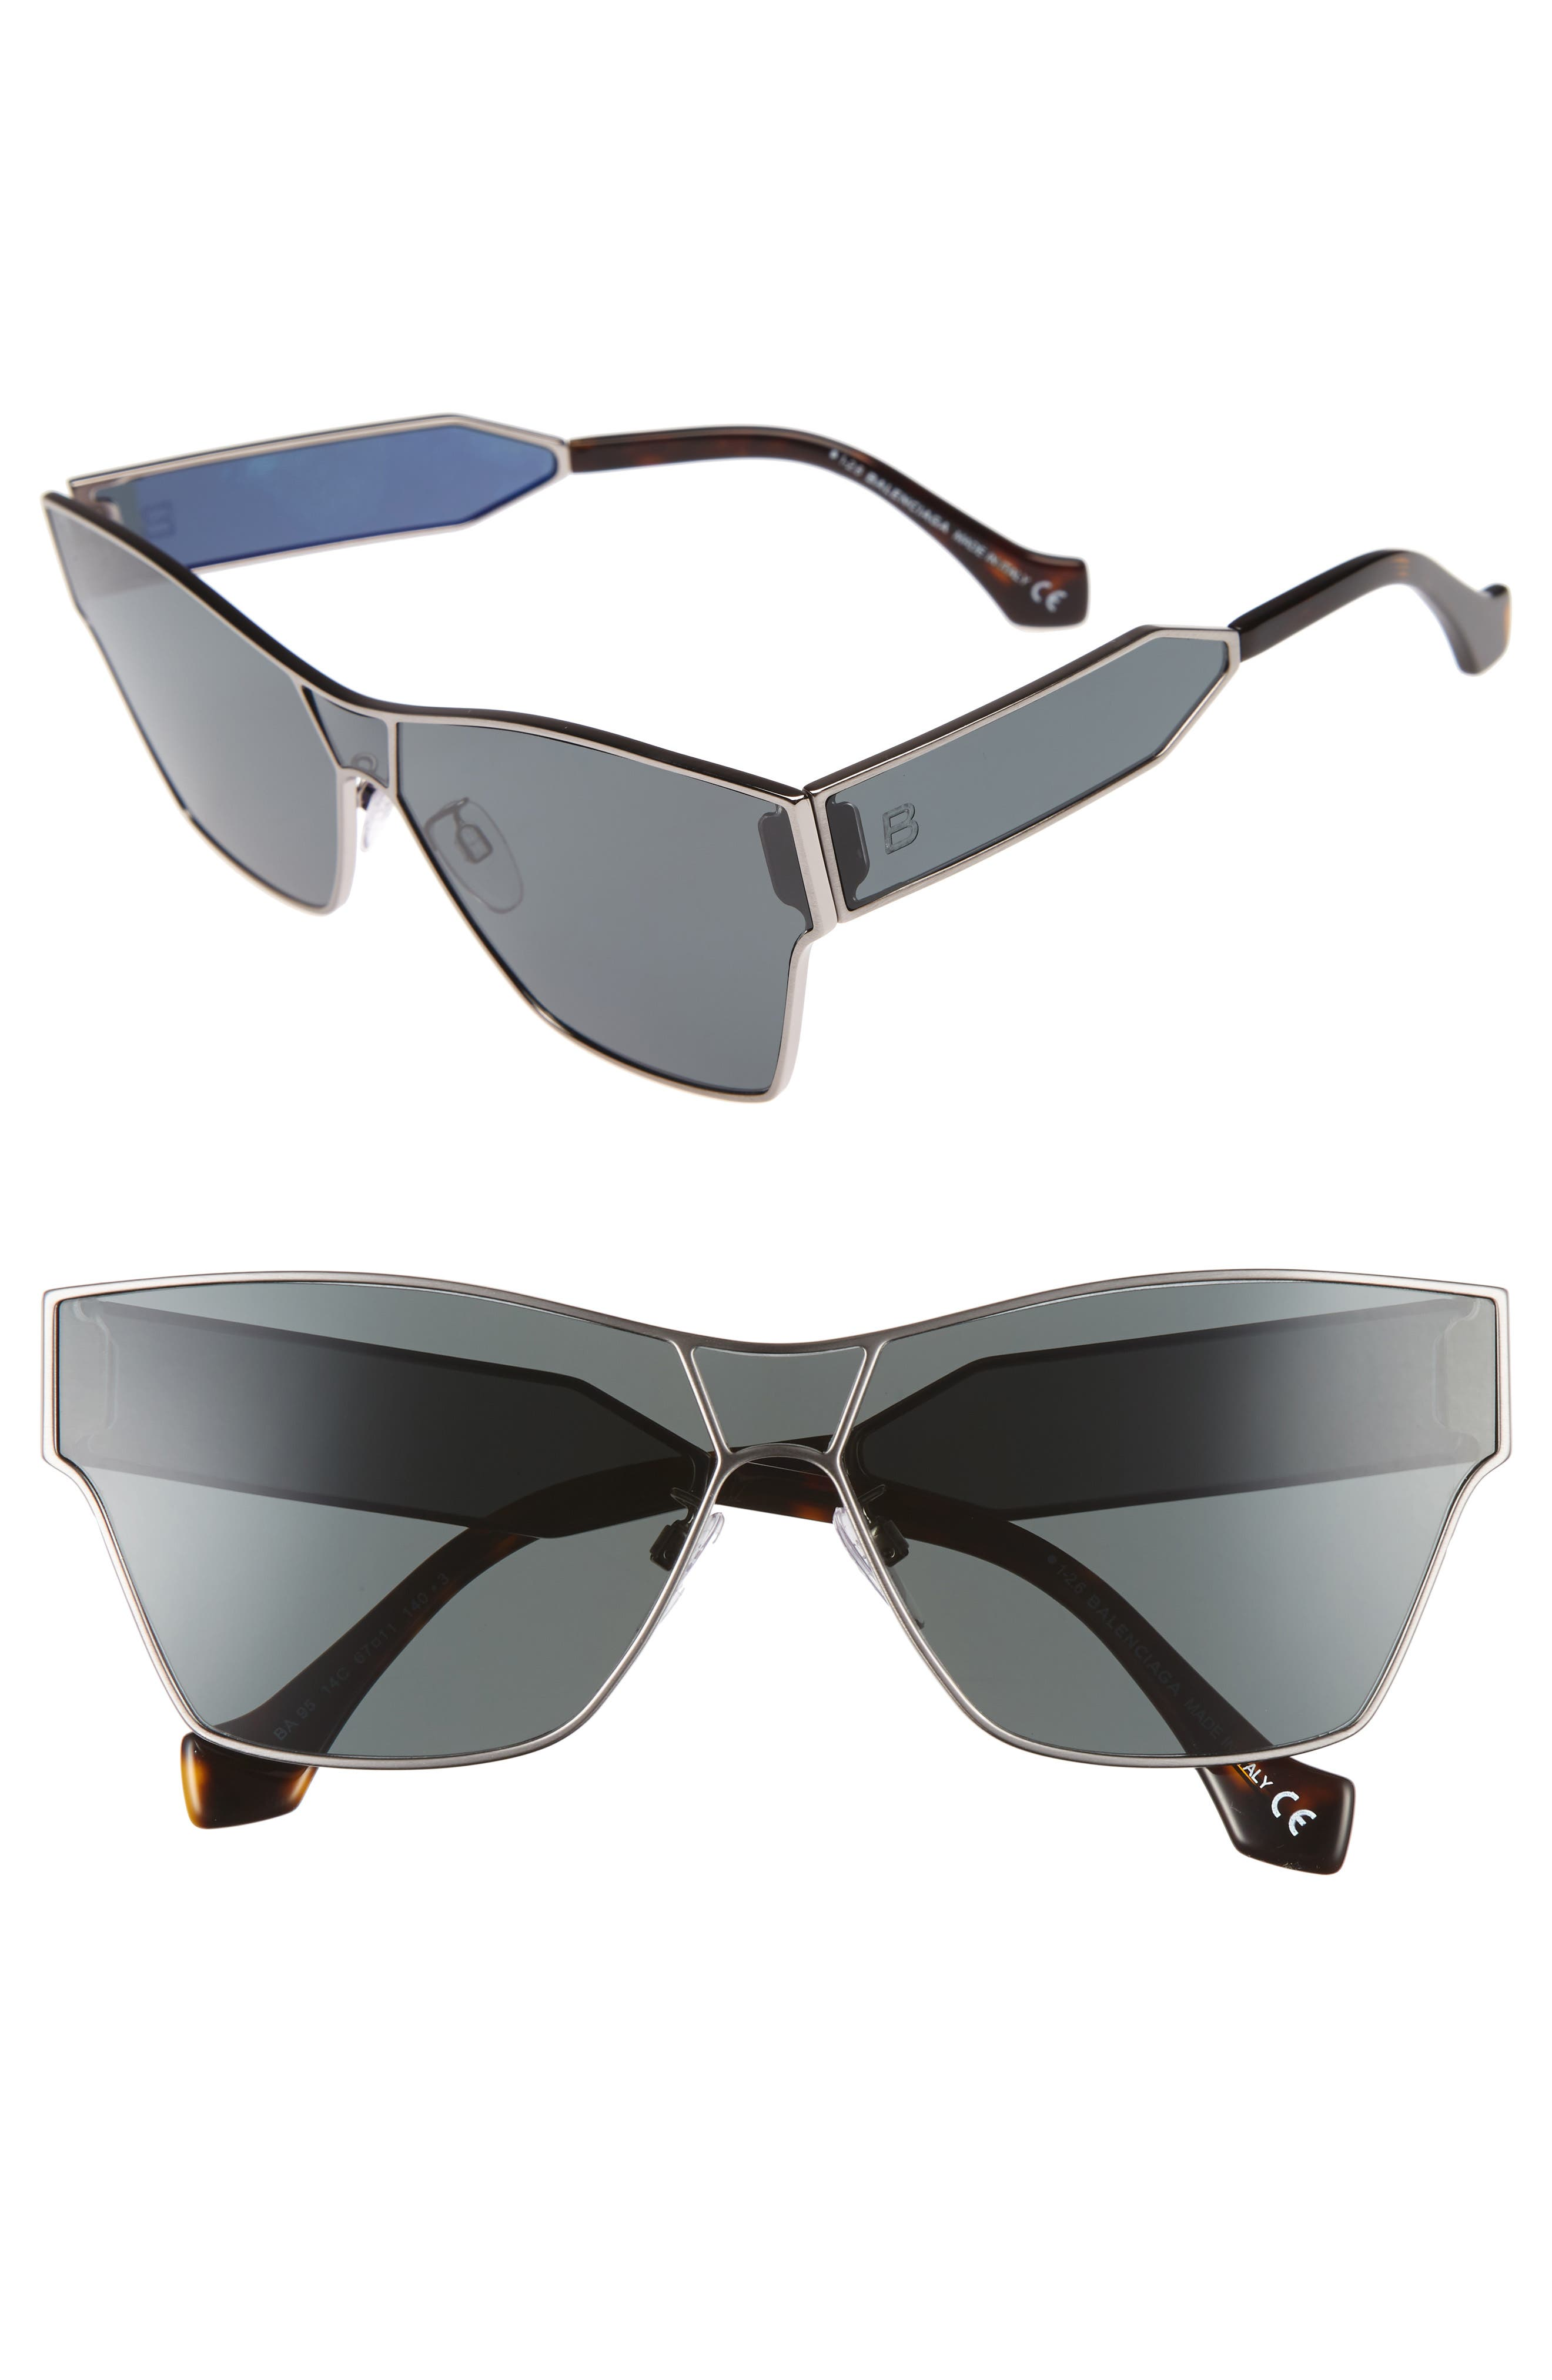 Main Image - Balenciaga 67mm Sunglasses